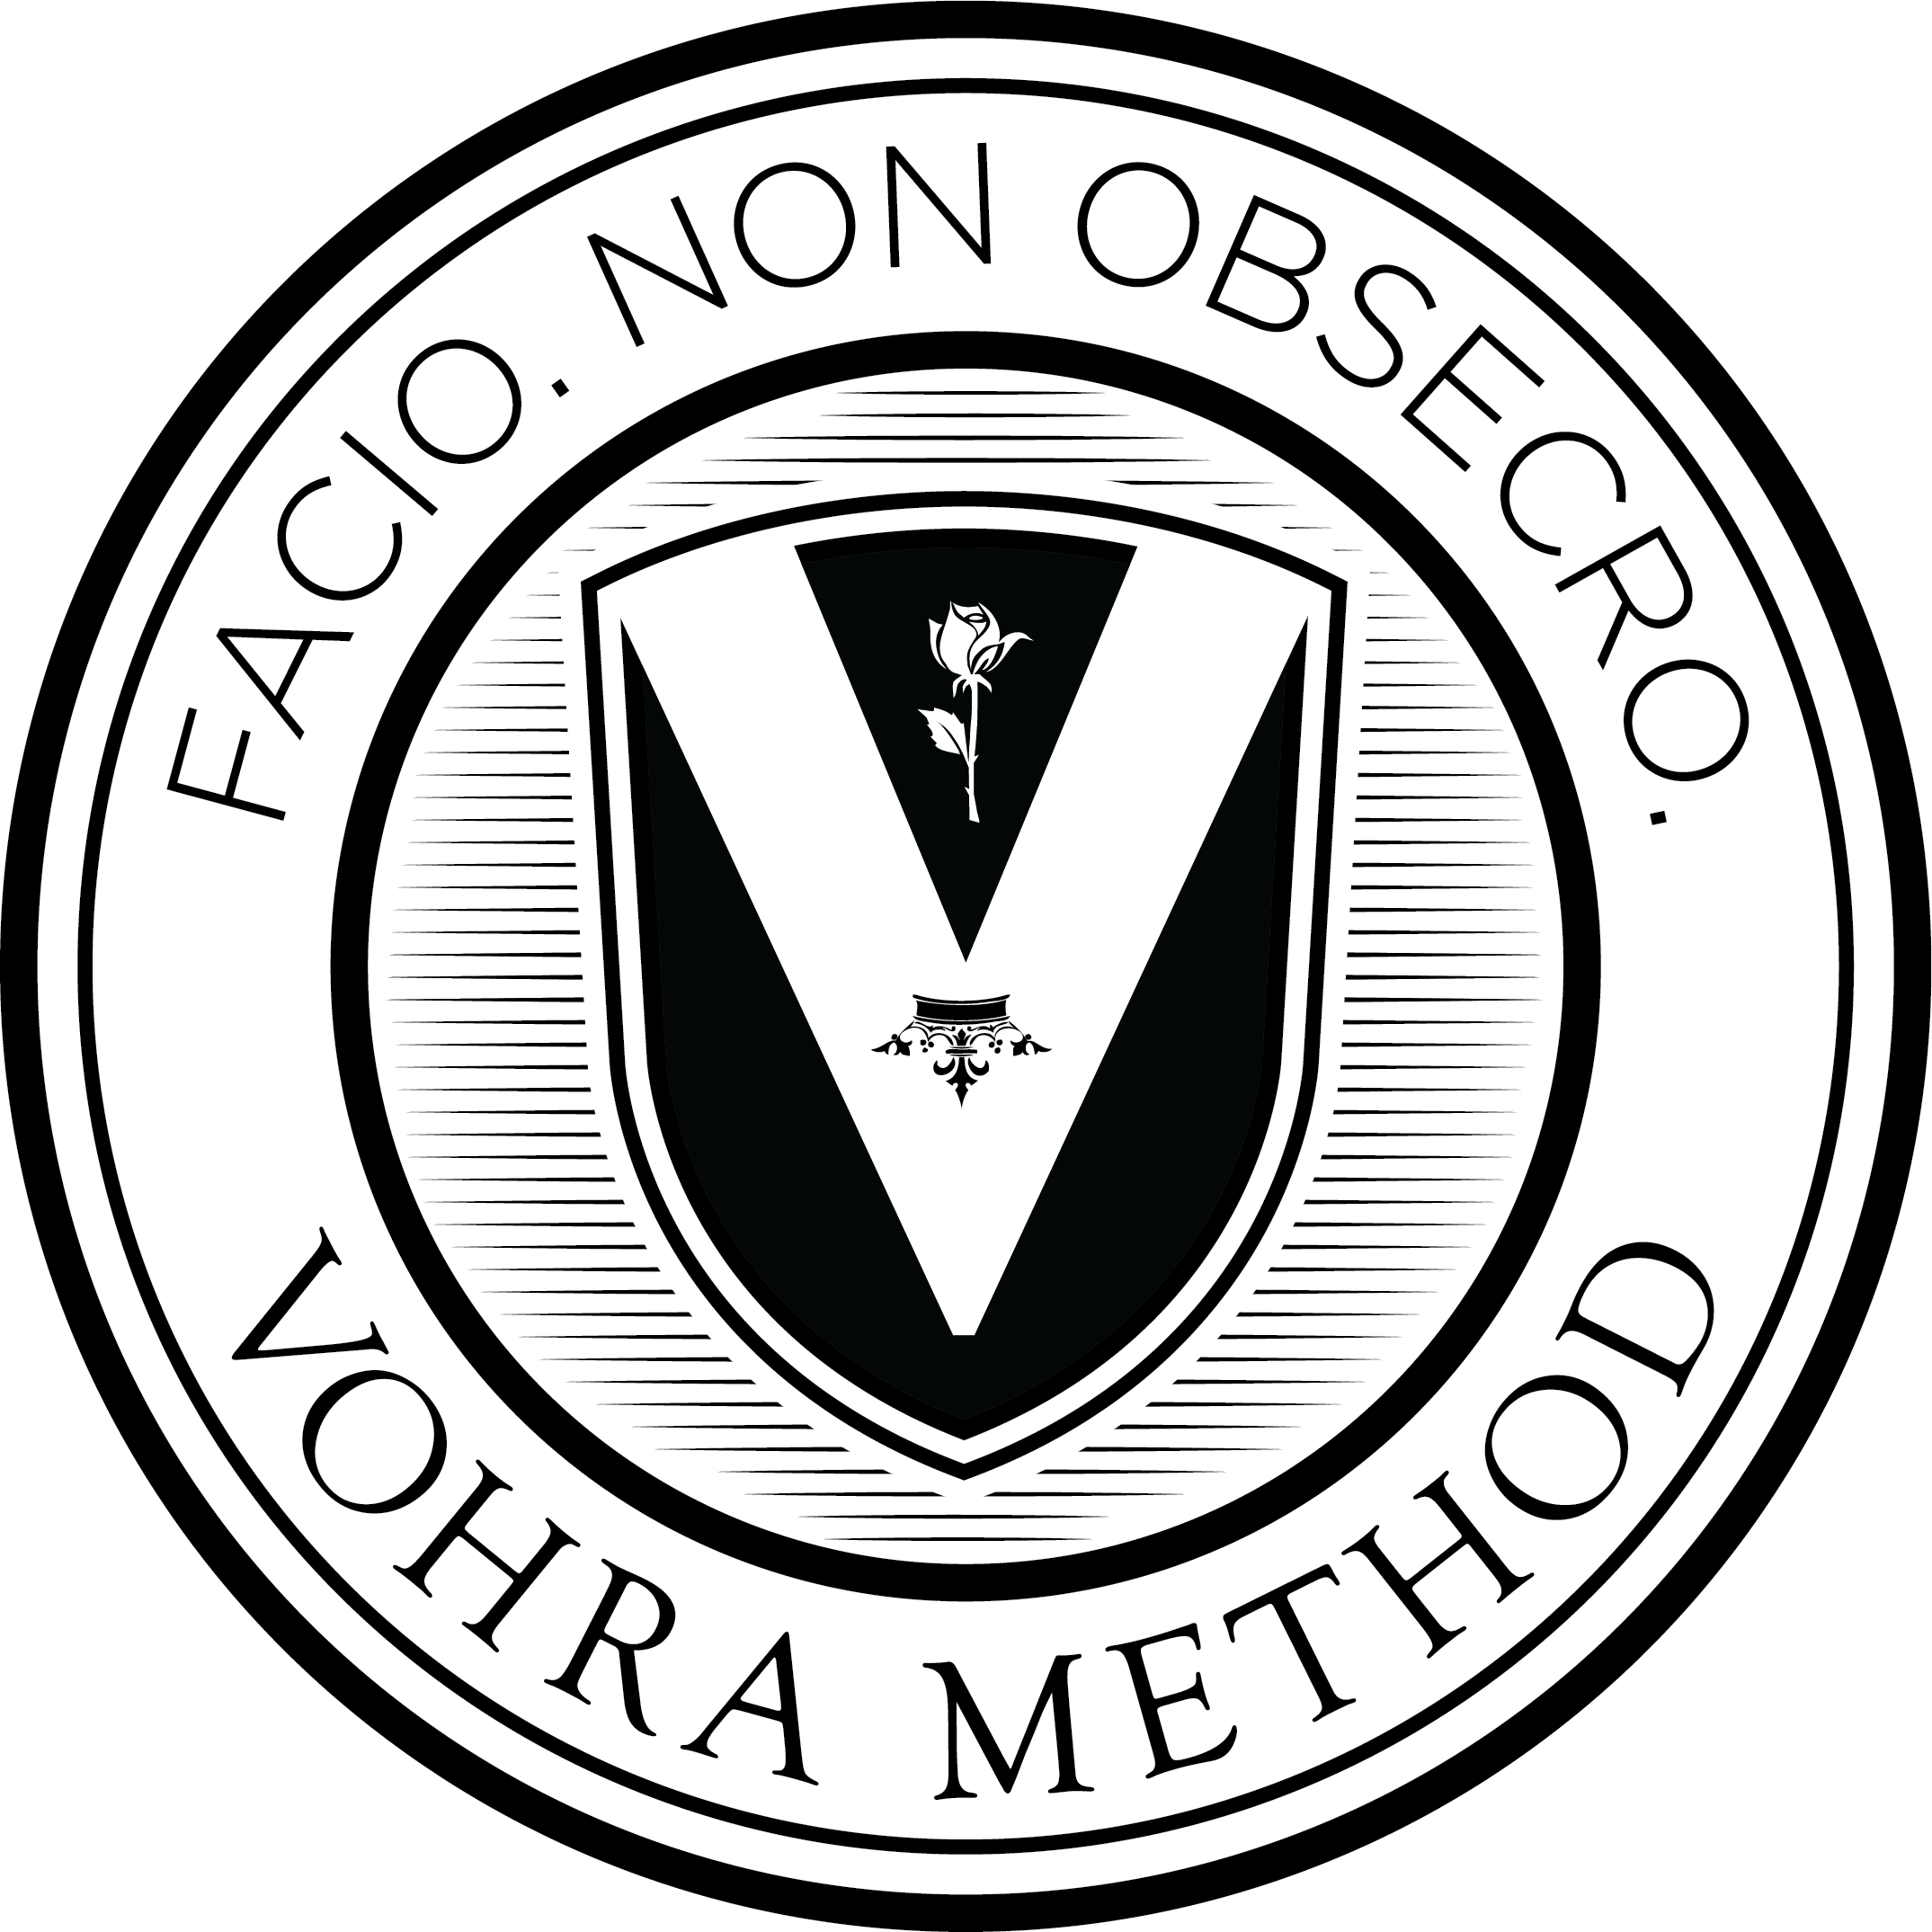 va-crest-vohra-method EDITABLE.png